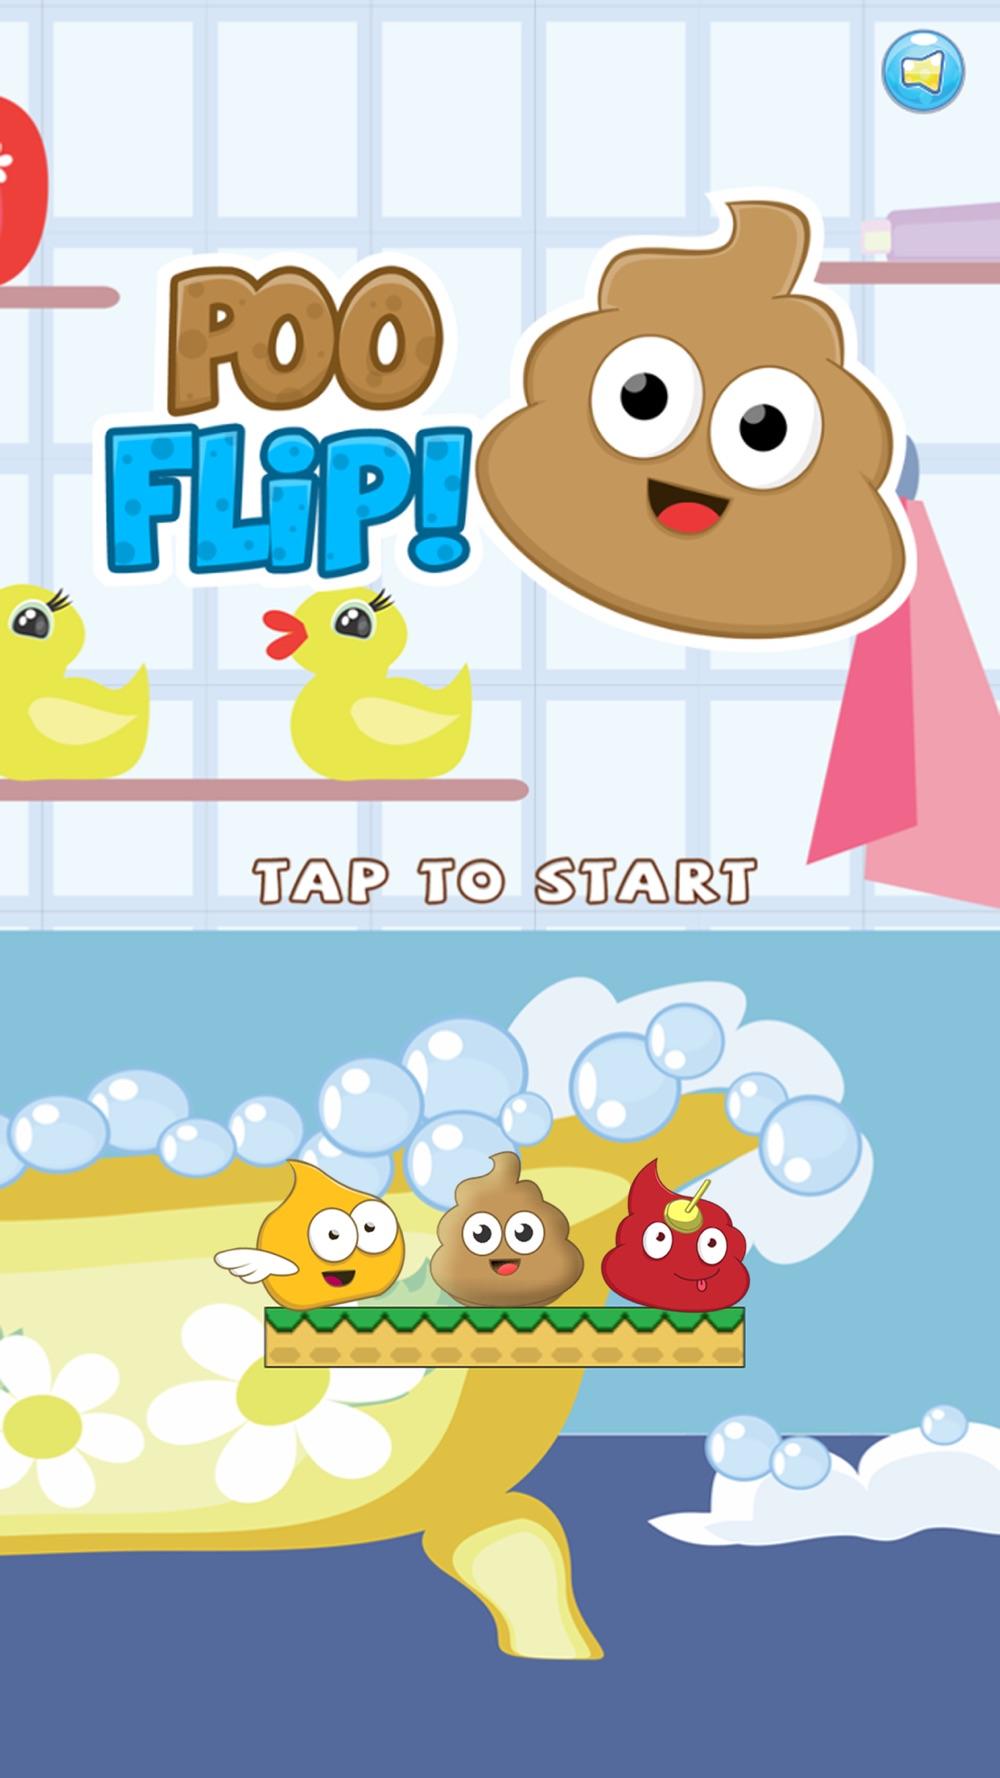 Farting Poo Flip Up! – Jump, Fart & Flying Goo Cheat Codes